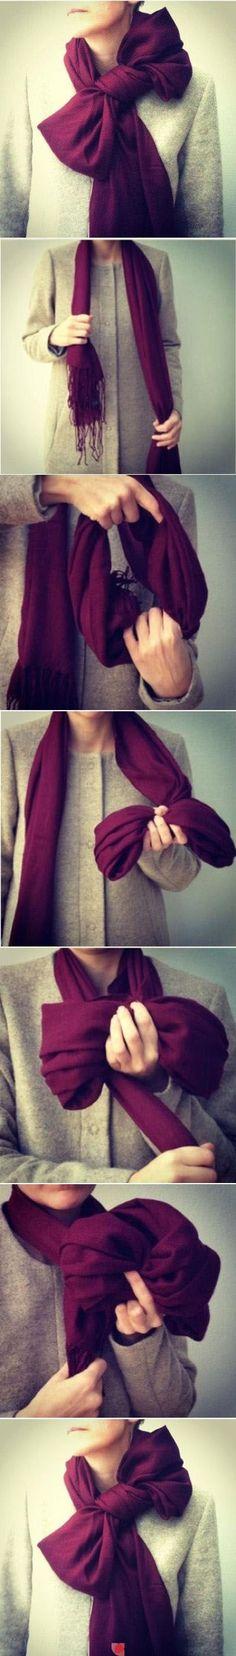 #scarves #silkscarves #headscarves #blanketscarves #knittedscarves #shawl #instantshawl #pashmina